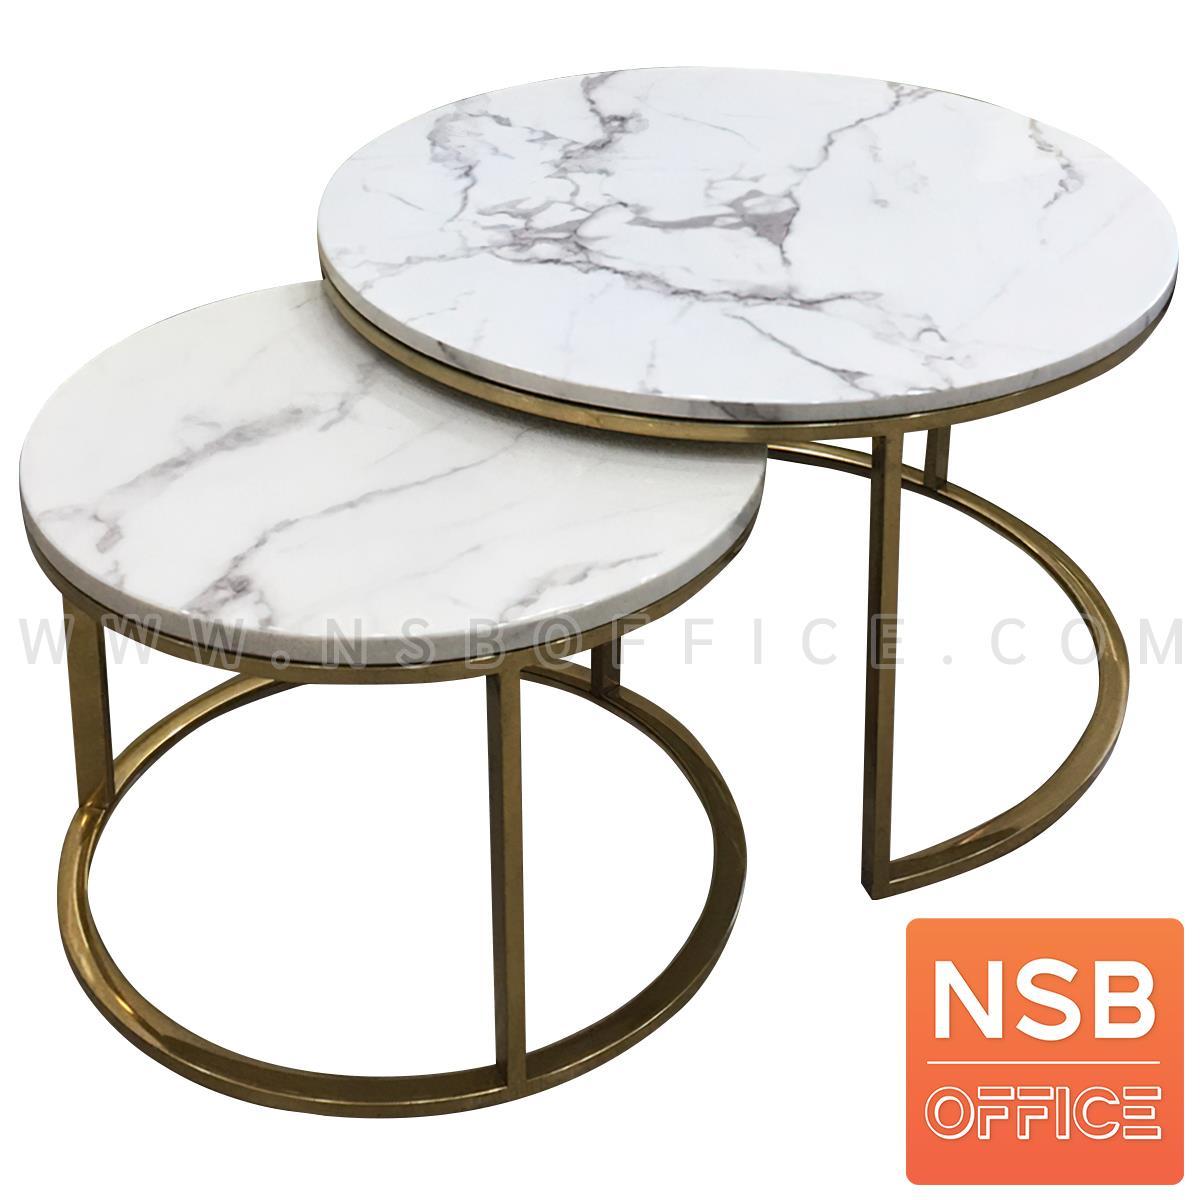 B13A303:โต๊ะกลางหินอ่อนสีขาว รุ่น Lightfine (ไลท์ไฟน์)   ขาสแตนเลสชุบทอง